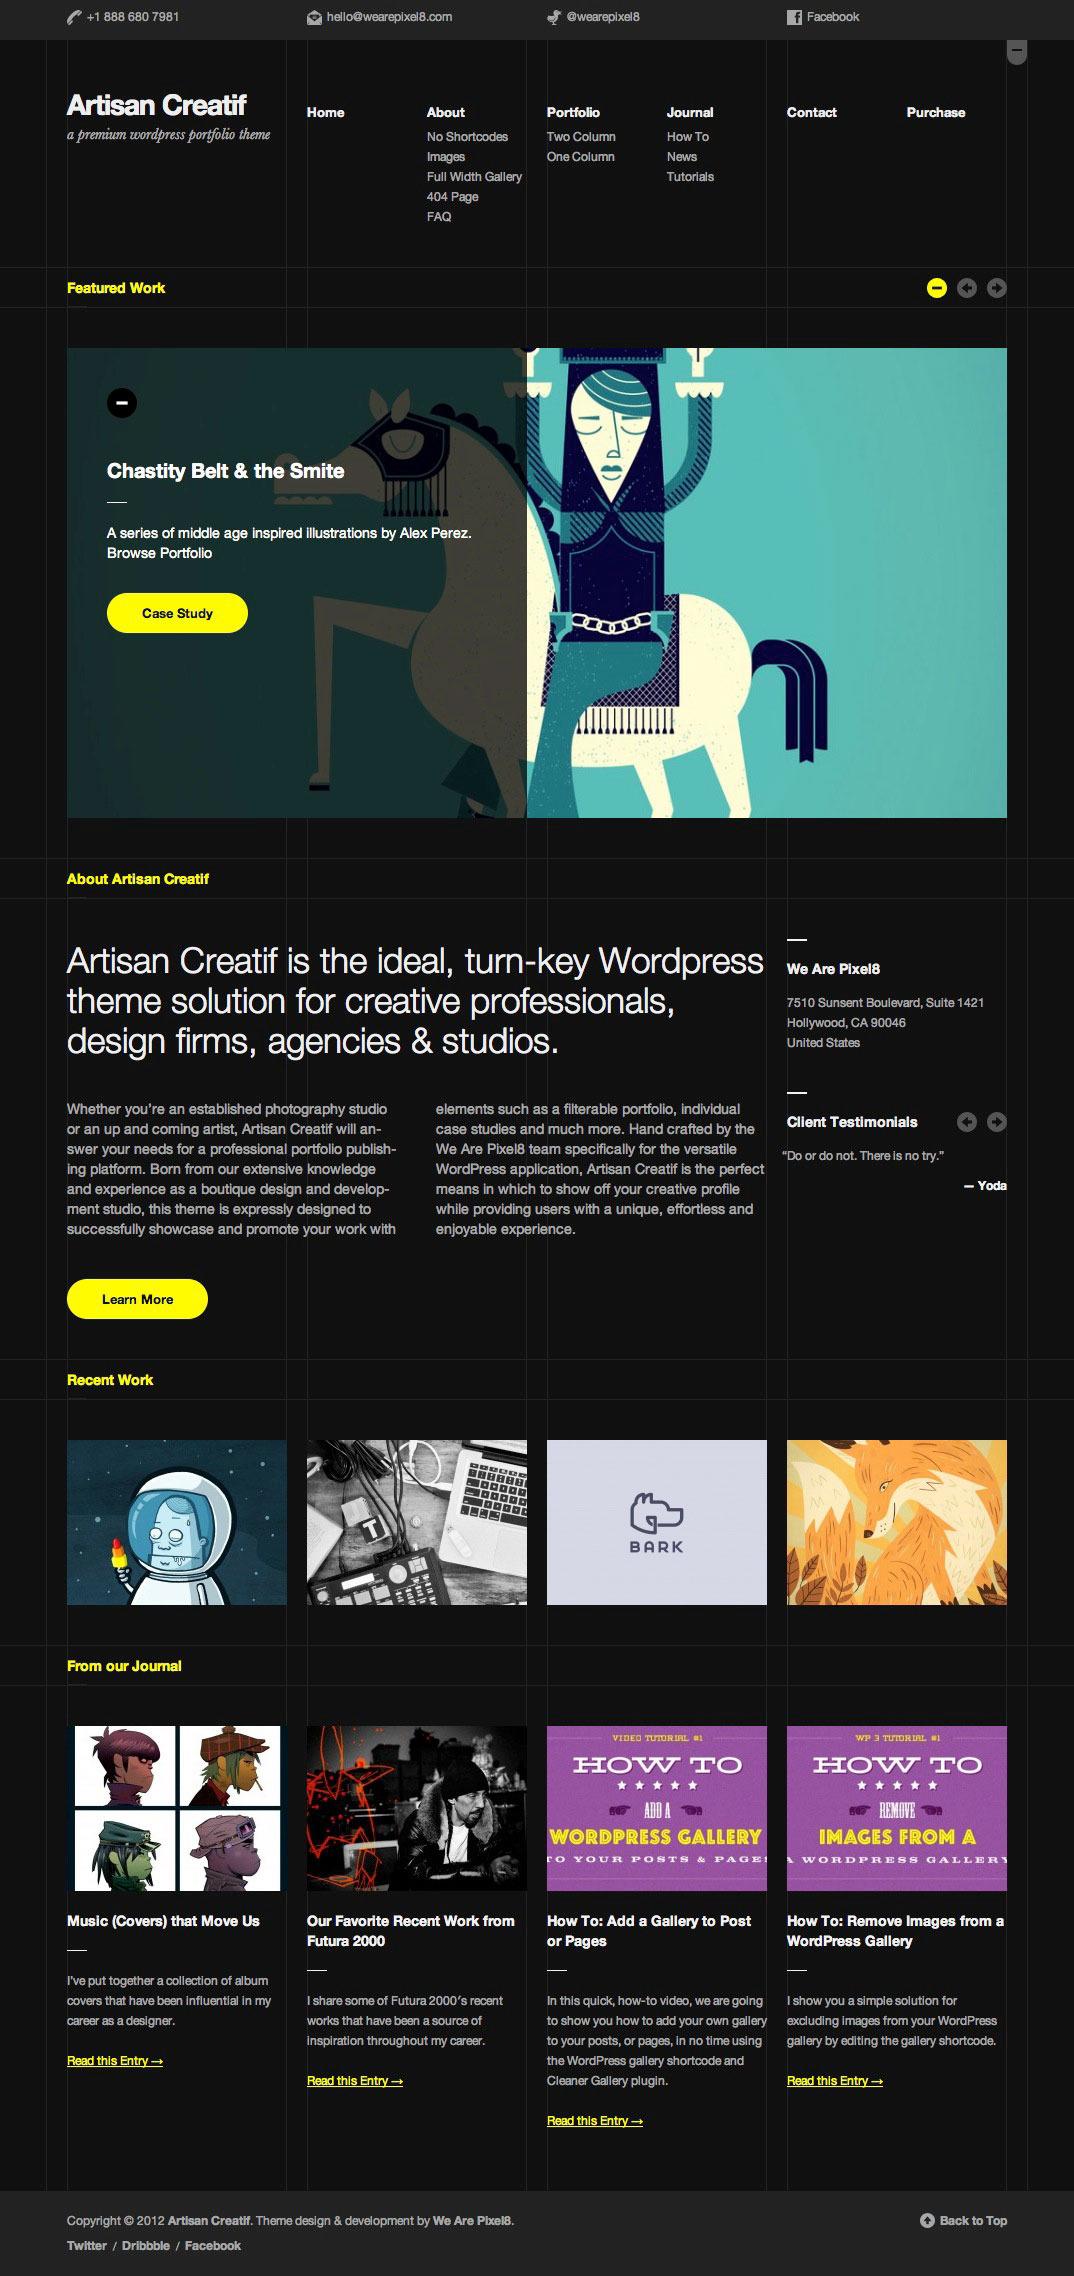 Artisan Creatif home dark